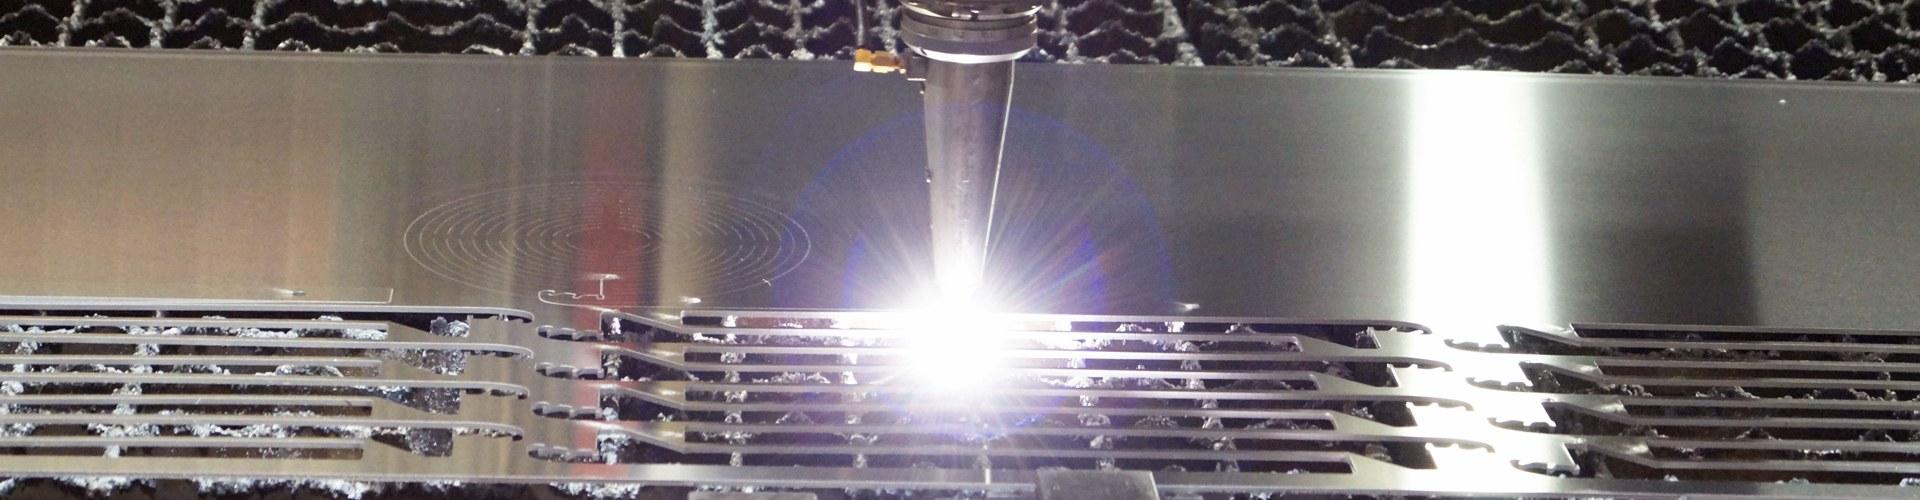 Laserschneiden lohnfertigung hsk nrw 2d 3d